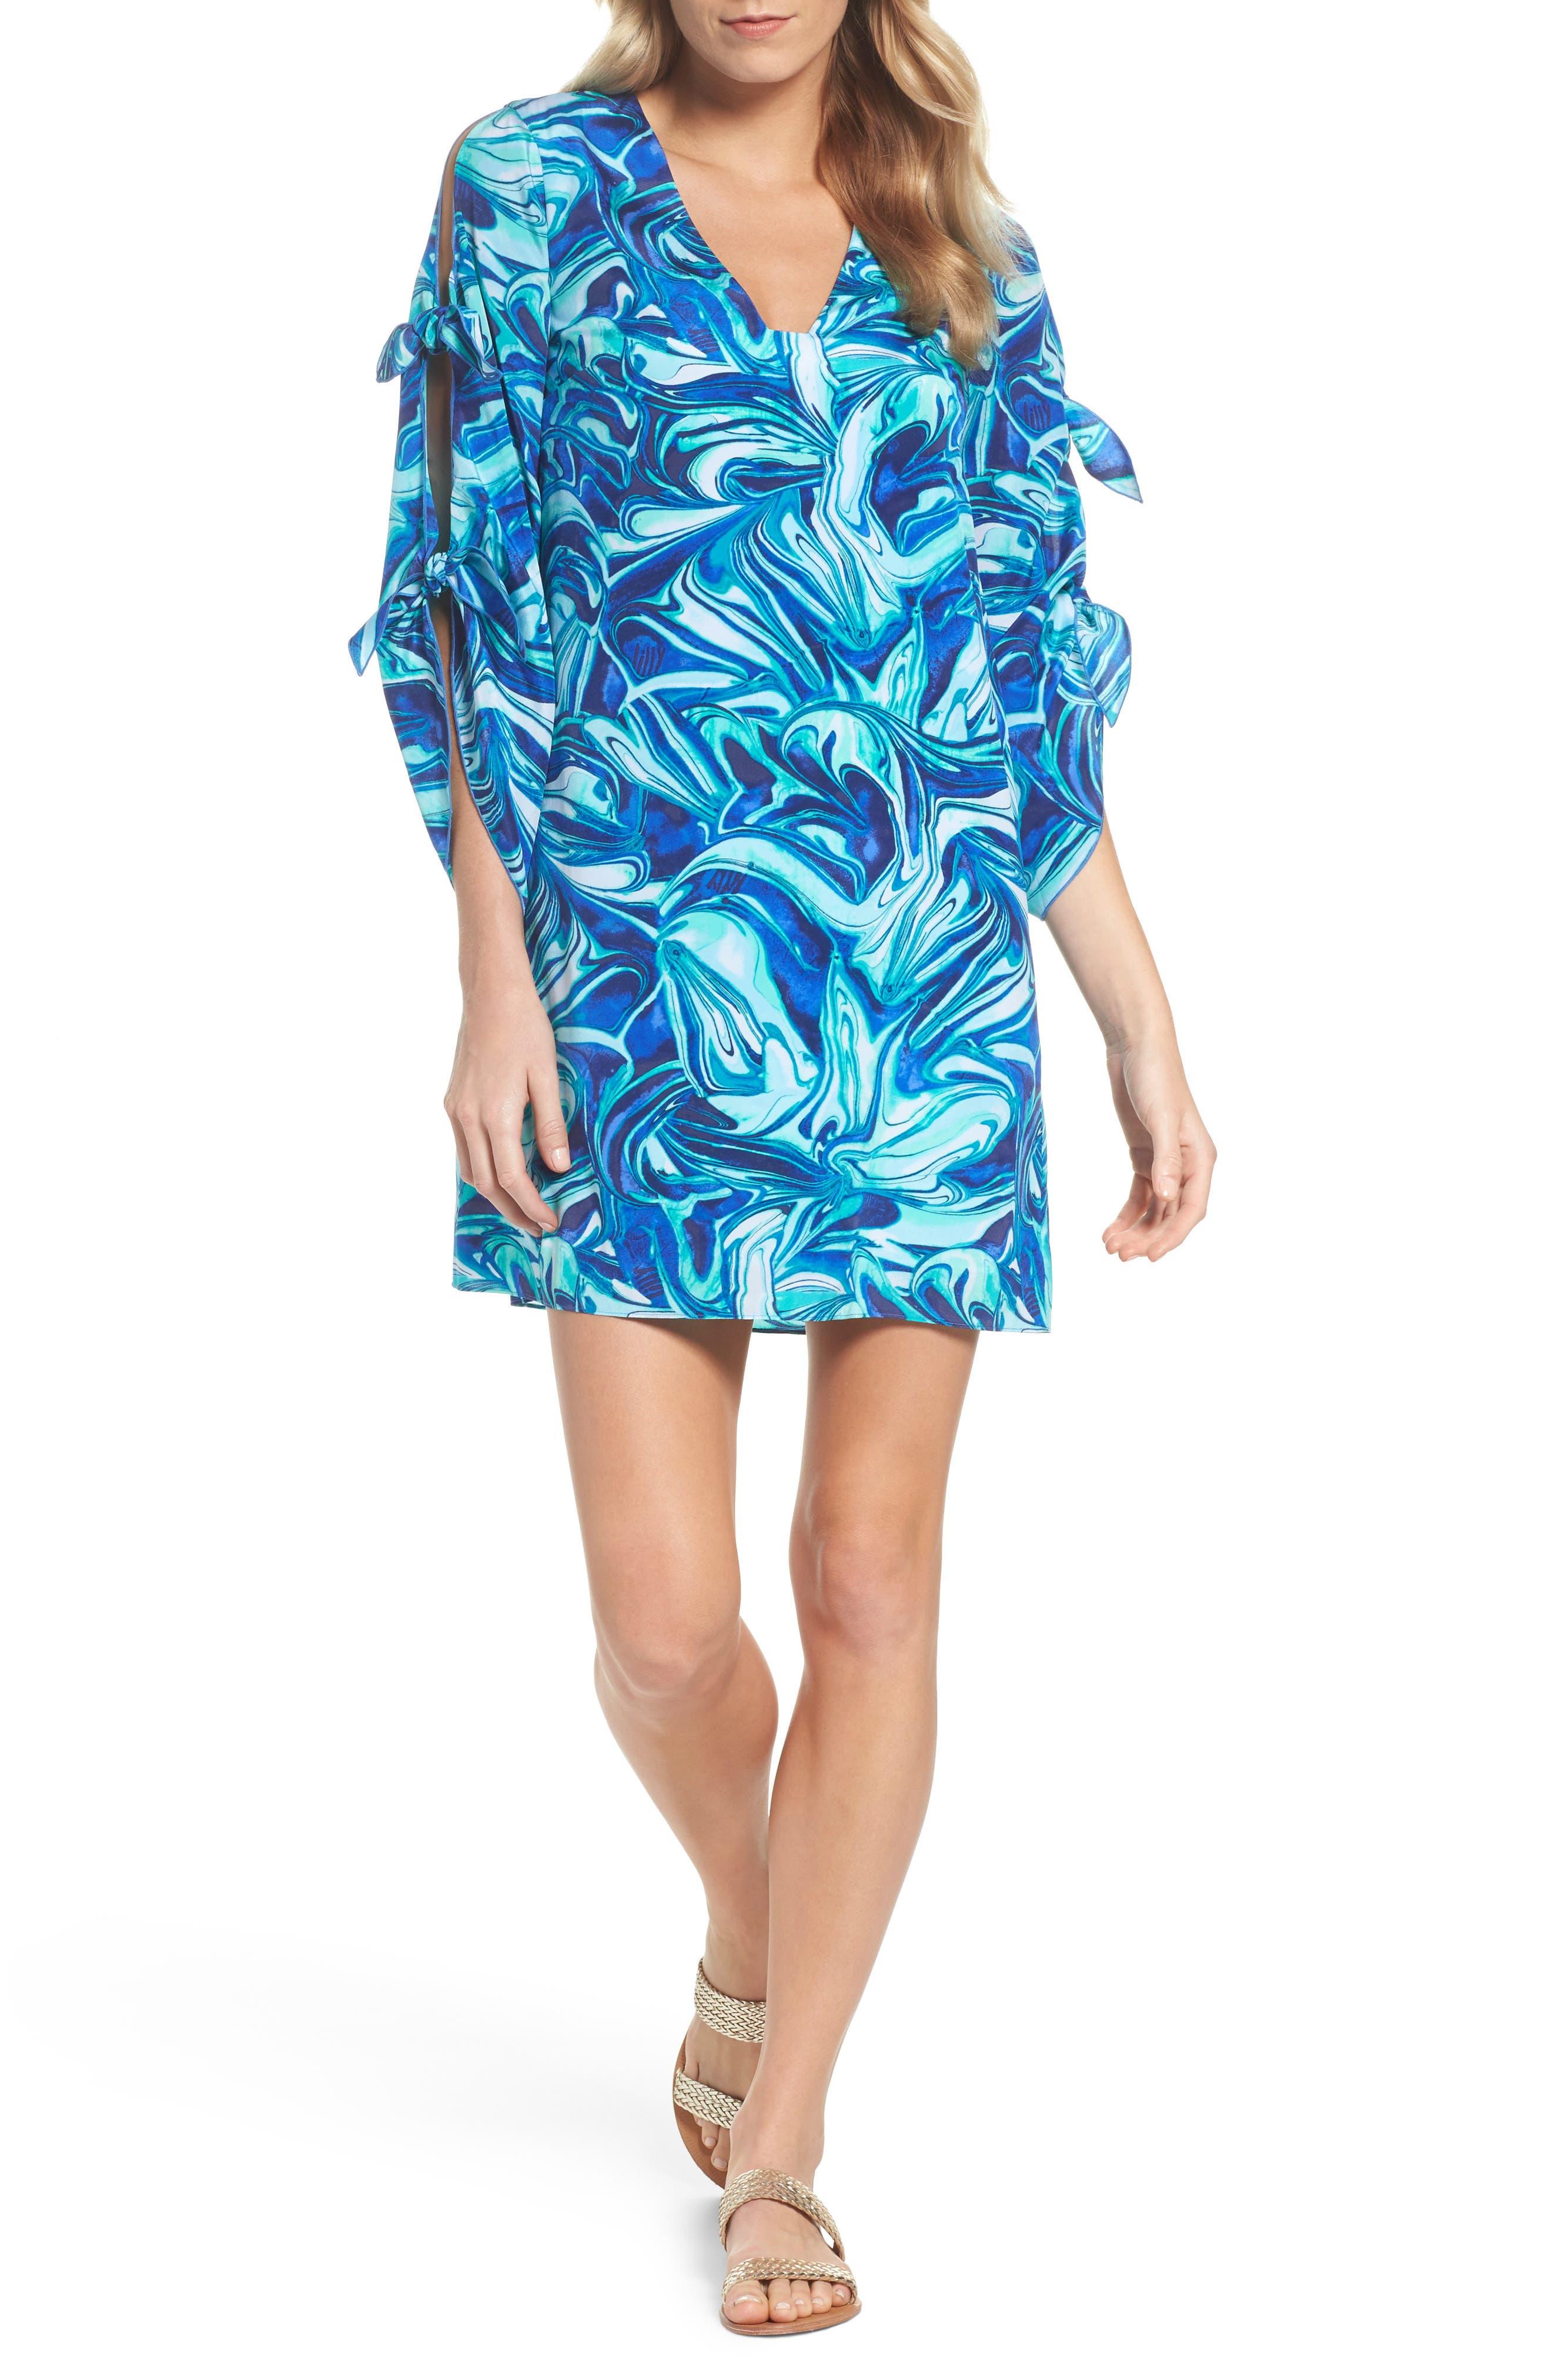 Avila Shift Dress,                             Main thumbnail 1, color,                             Ikat Blue Ocean Waves